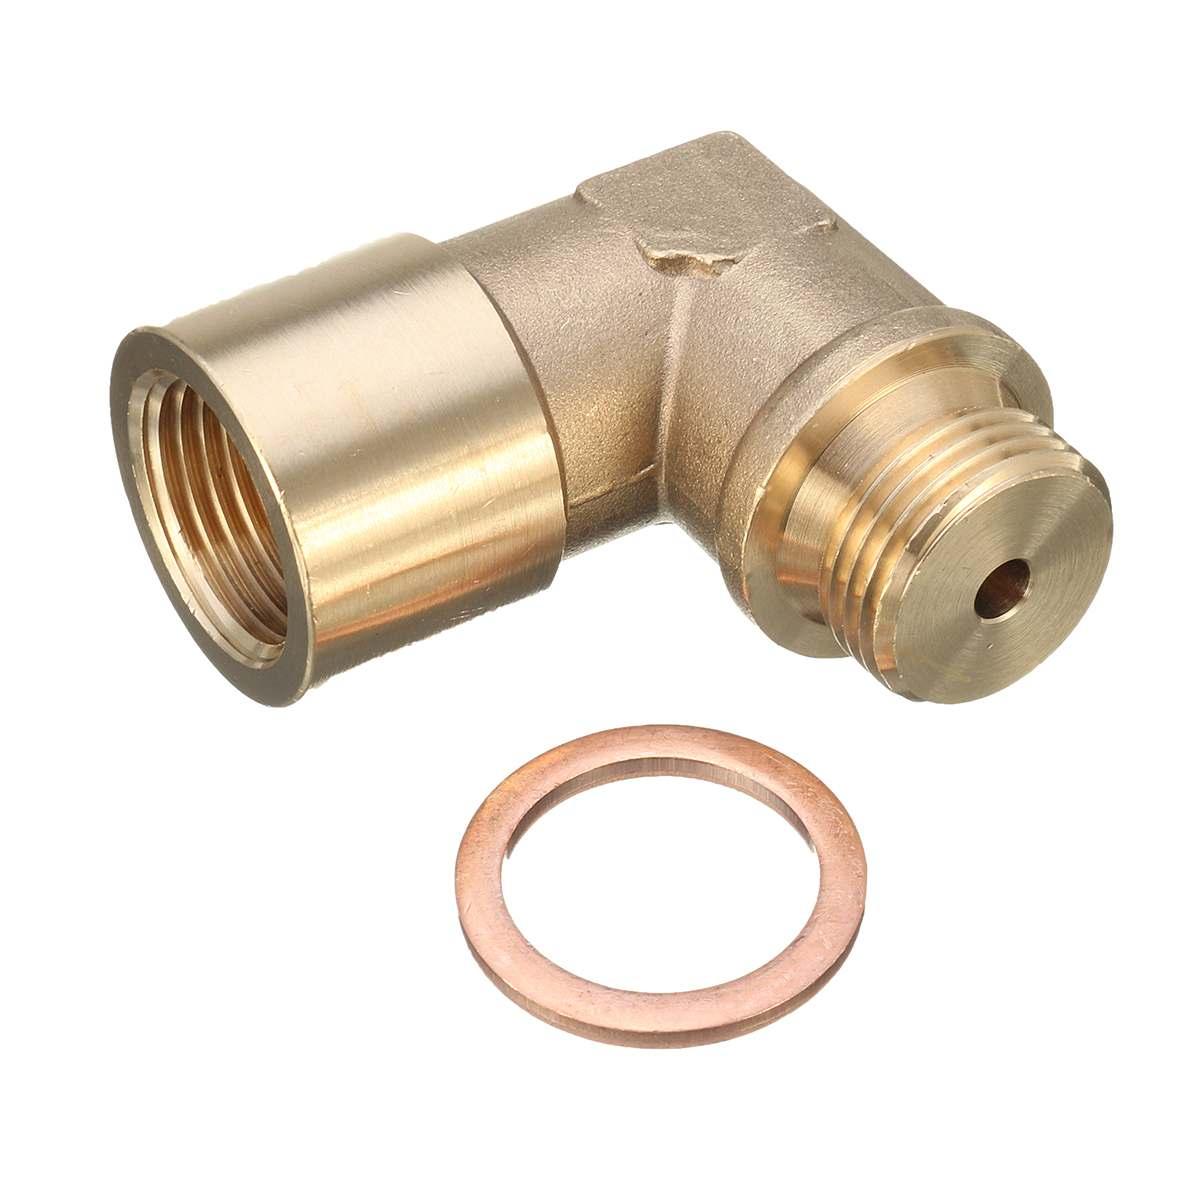 M18X1.5 O2 Angled Oxygen Sensor Lambda Extension Spacer Brass For Decat /Hydrogen